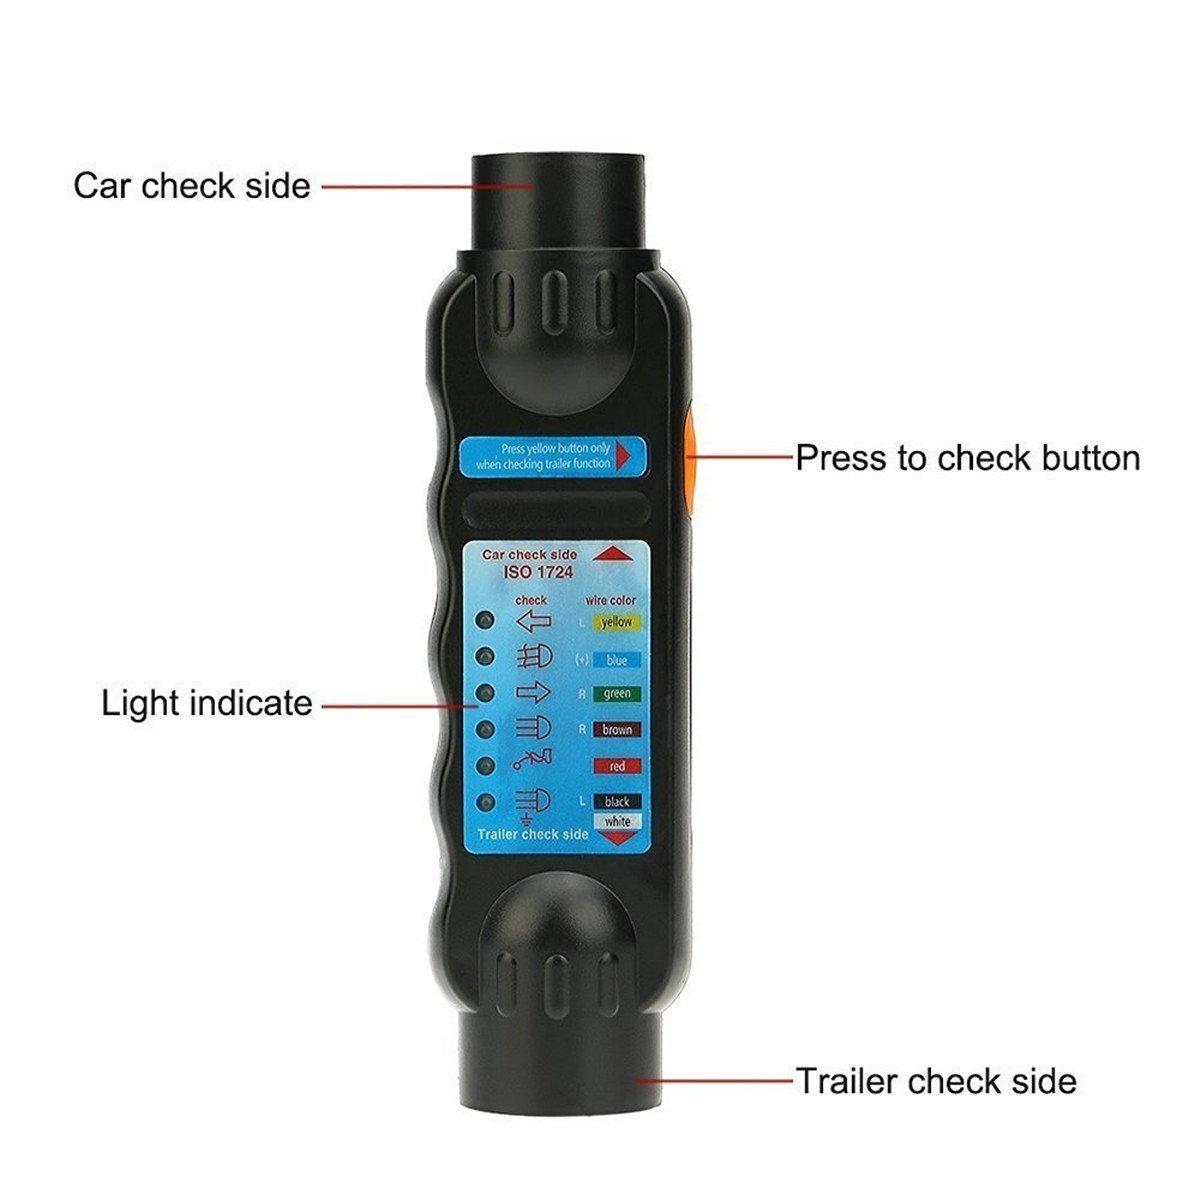 Yosoo Towing Trailer 7-pin 12V Car Truck Vehicle Trailer Plug Socket Connection Tester Wiring Circuit Light Diagnostic Tool